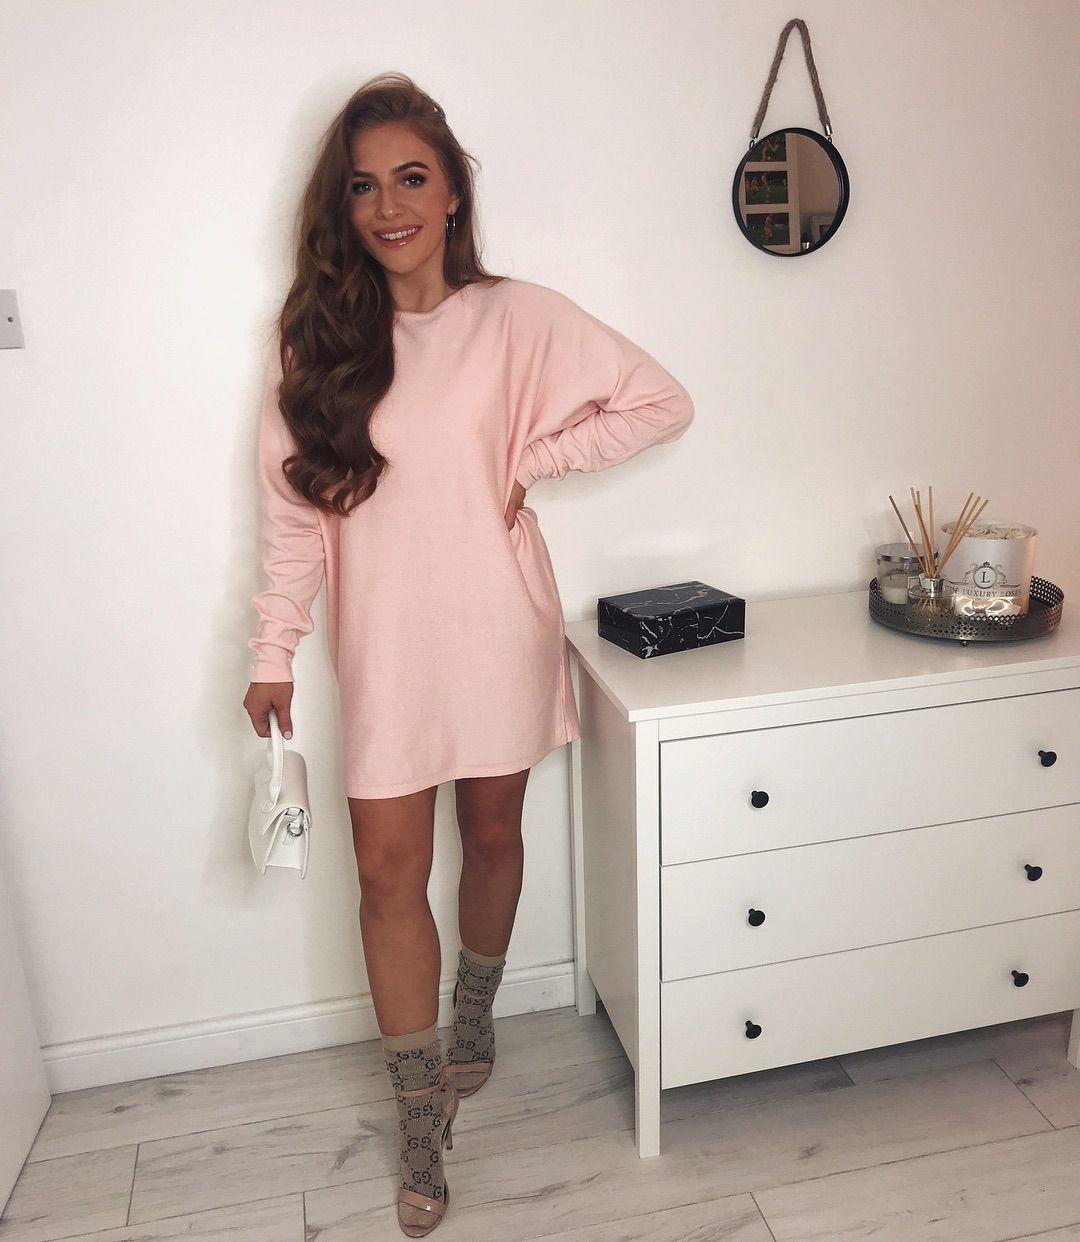 b6e3761d5c9 Oversized Knit Batwing Jumper Dress Pink in 2019